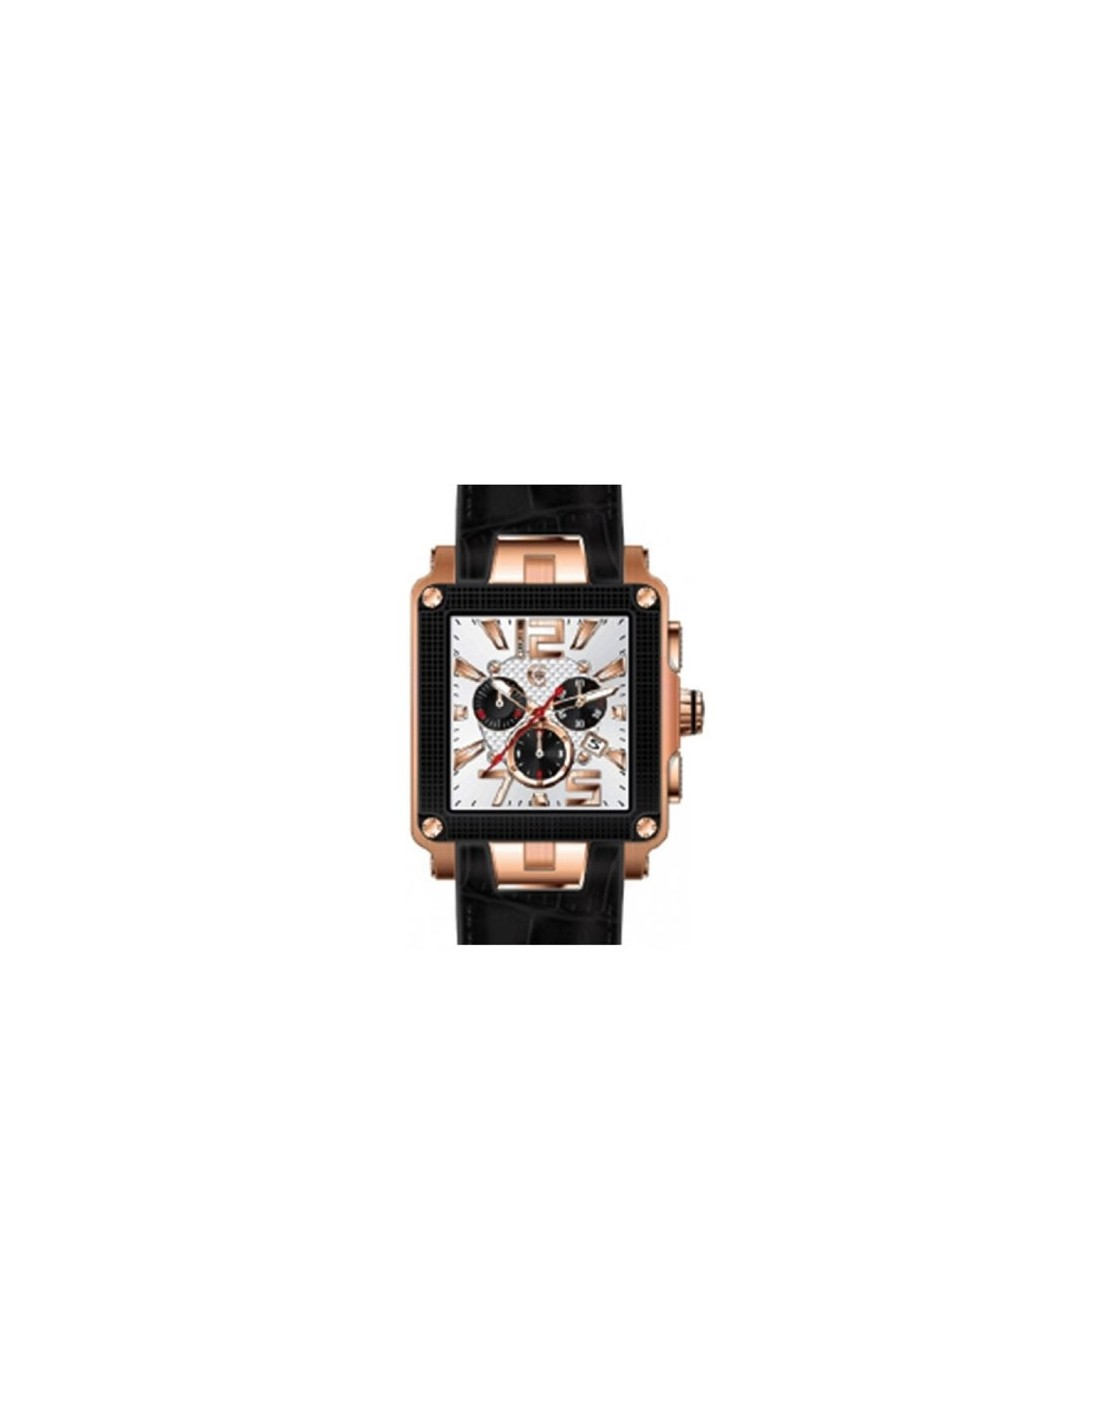 5800dcafbd CRB012D212G | Cerruti 1881 Watch CRB012D212G - Cerruti 1881 Watches